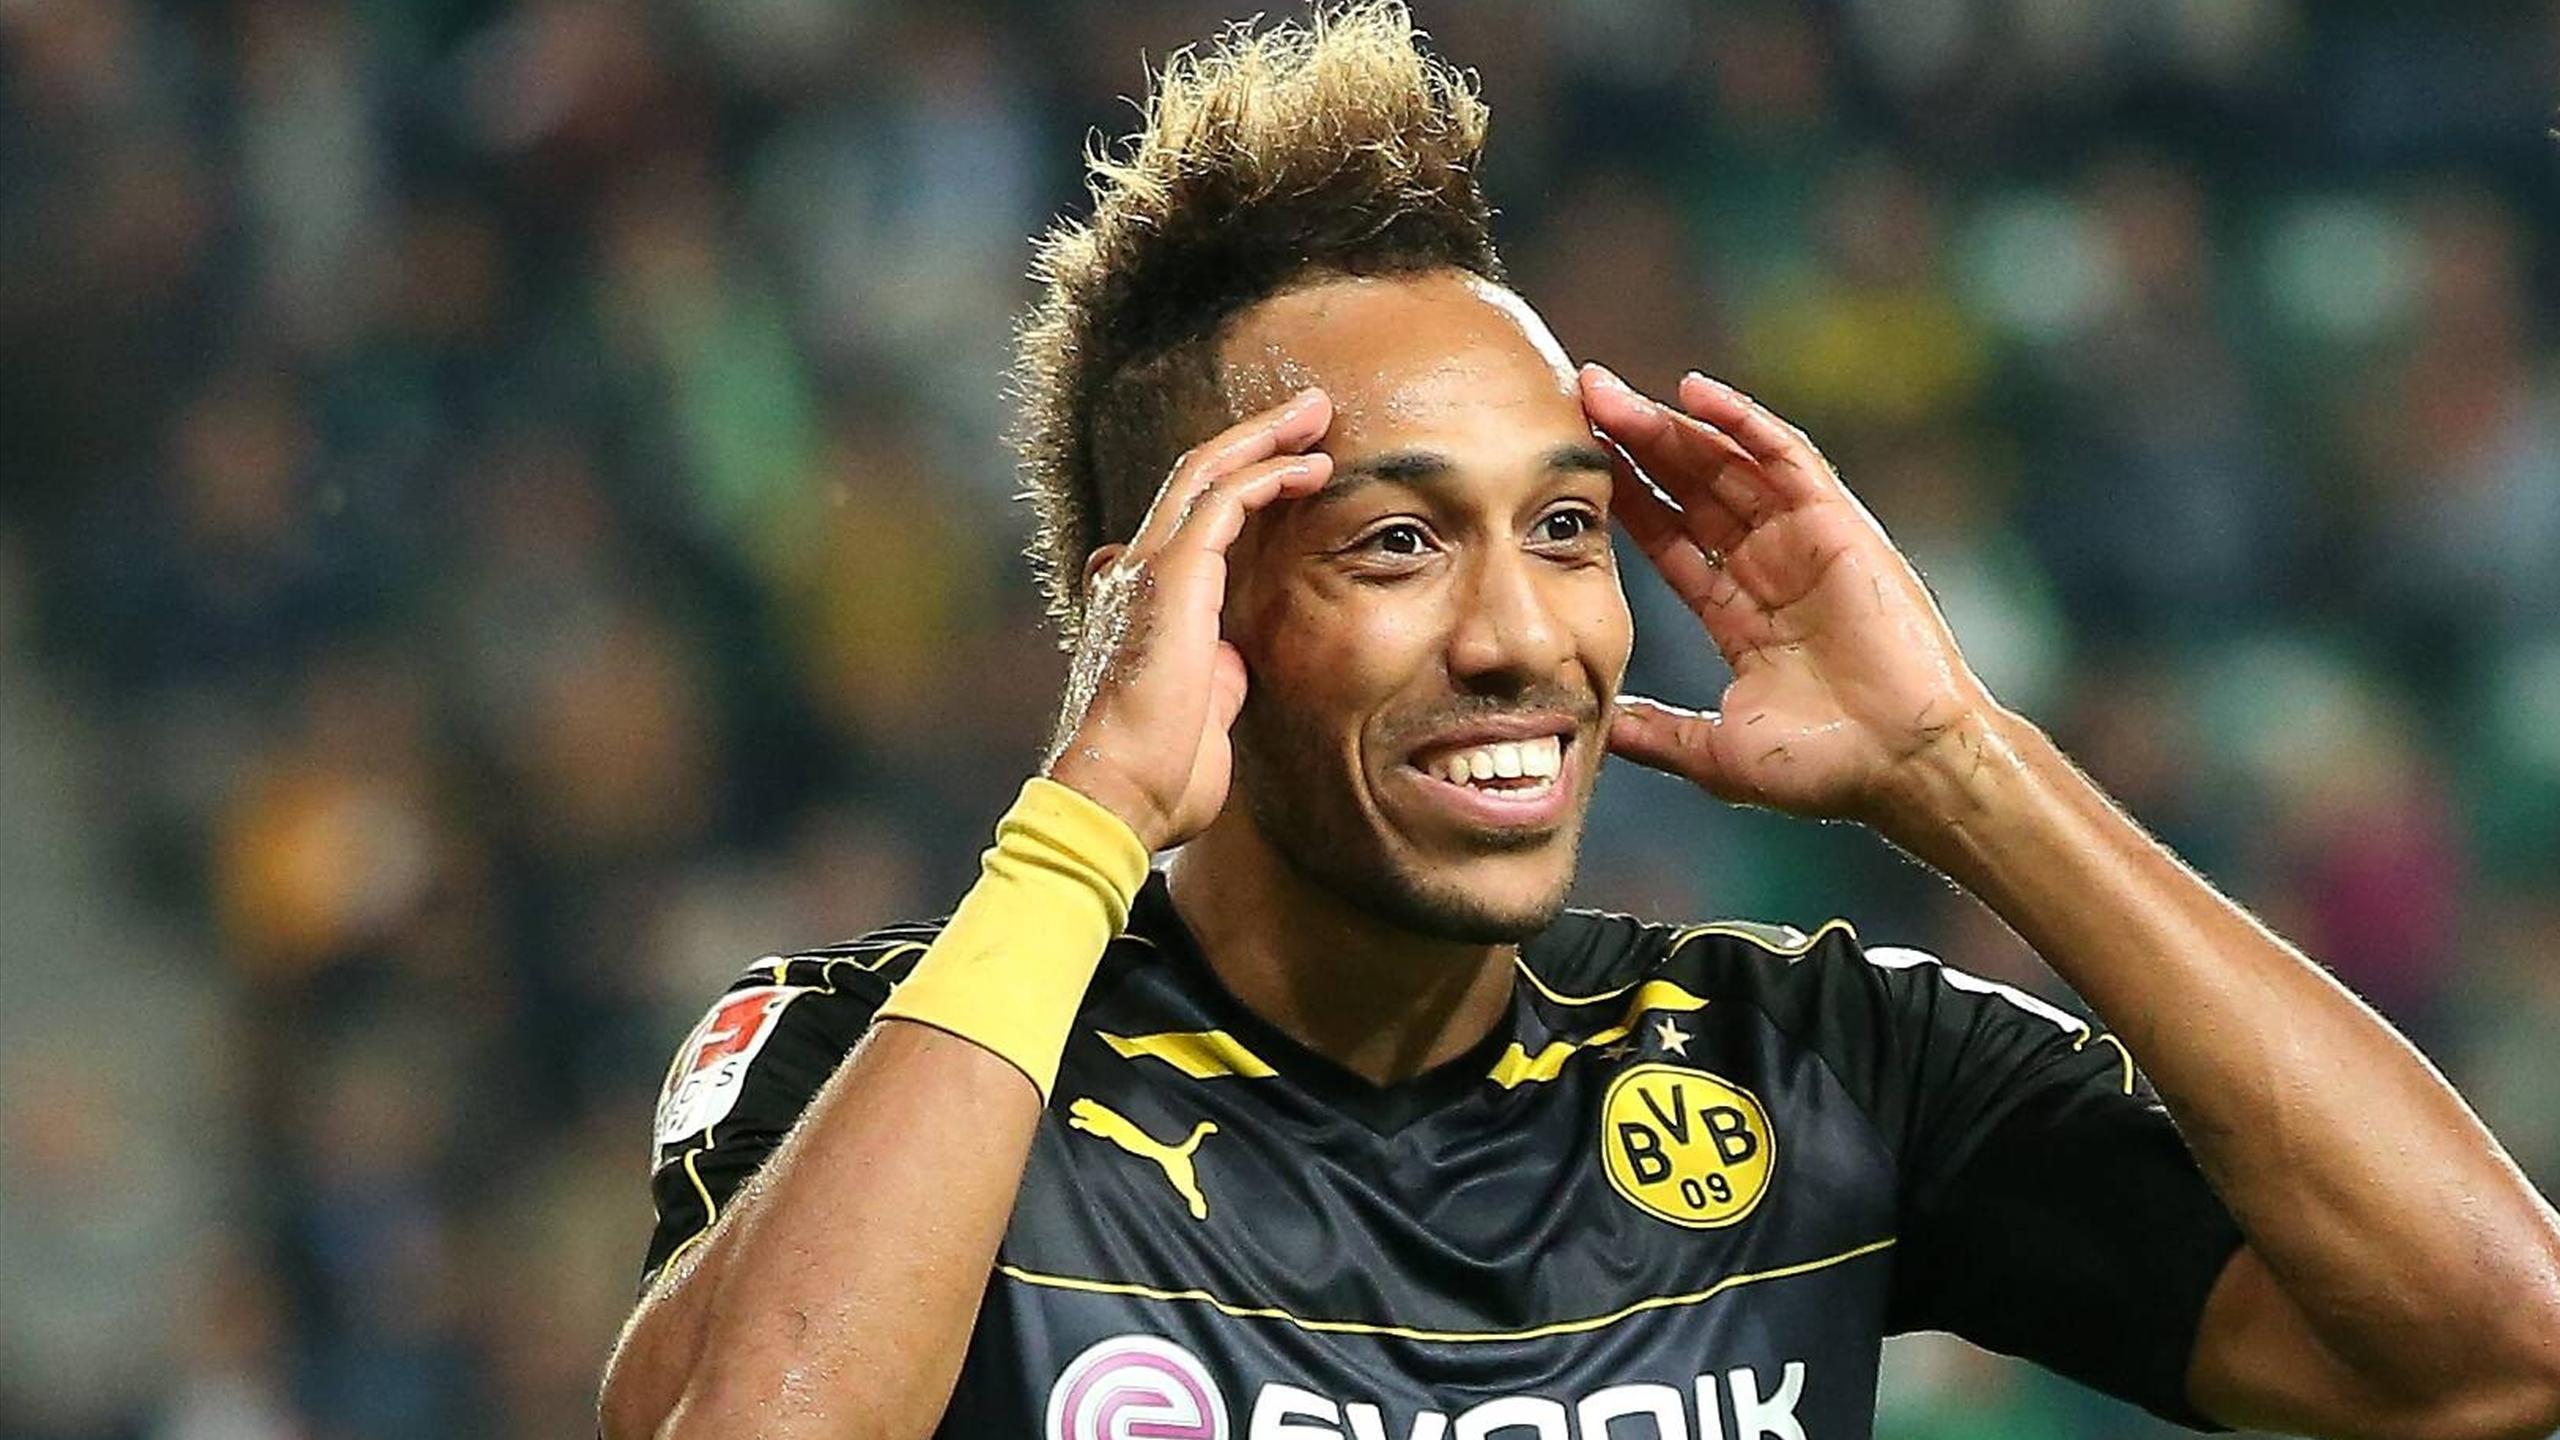 Pierre-Emerick Aubameyang (Borussia Dortmund) 2016/17